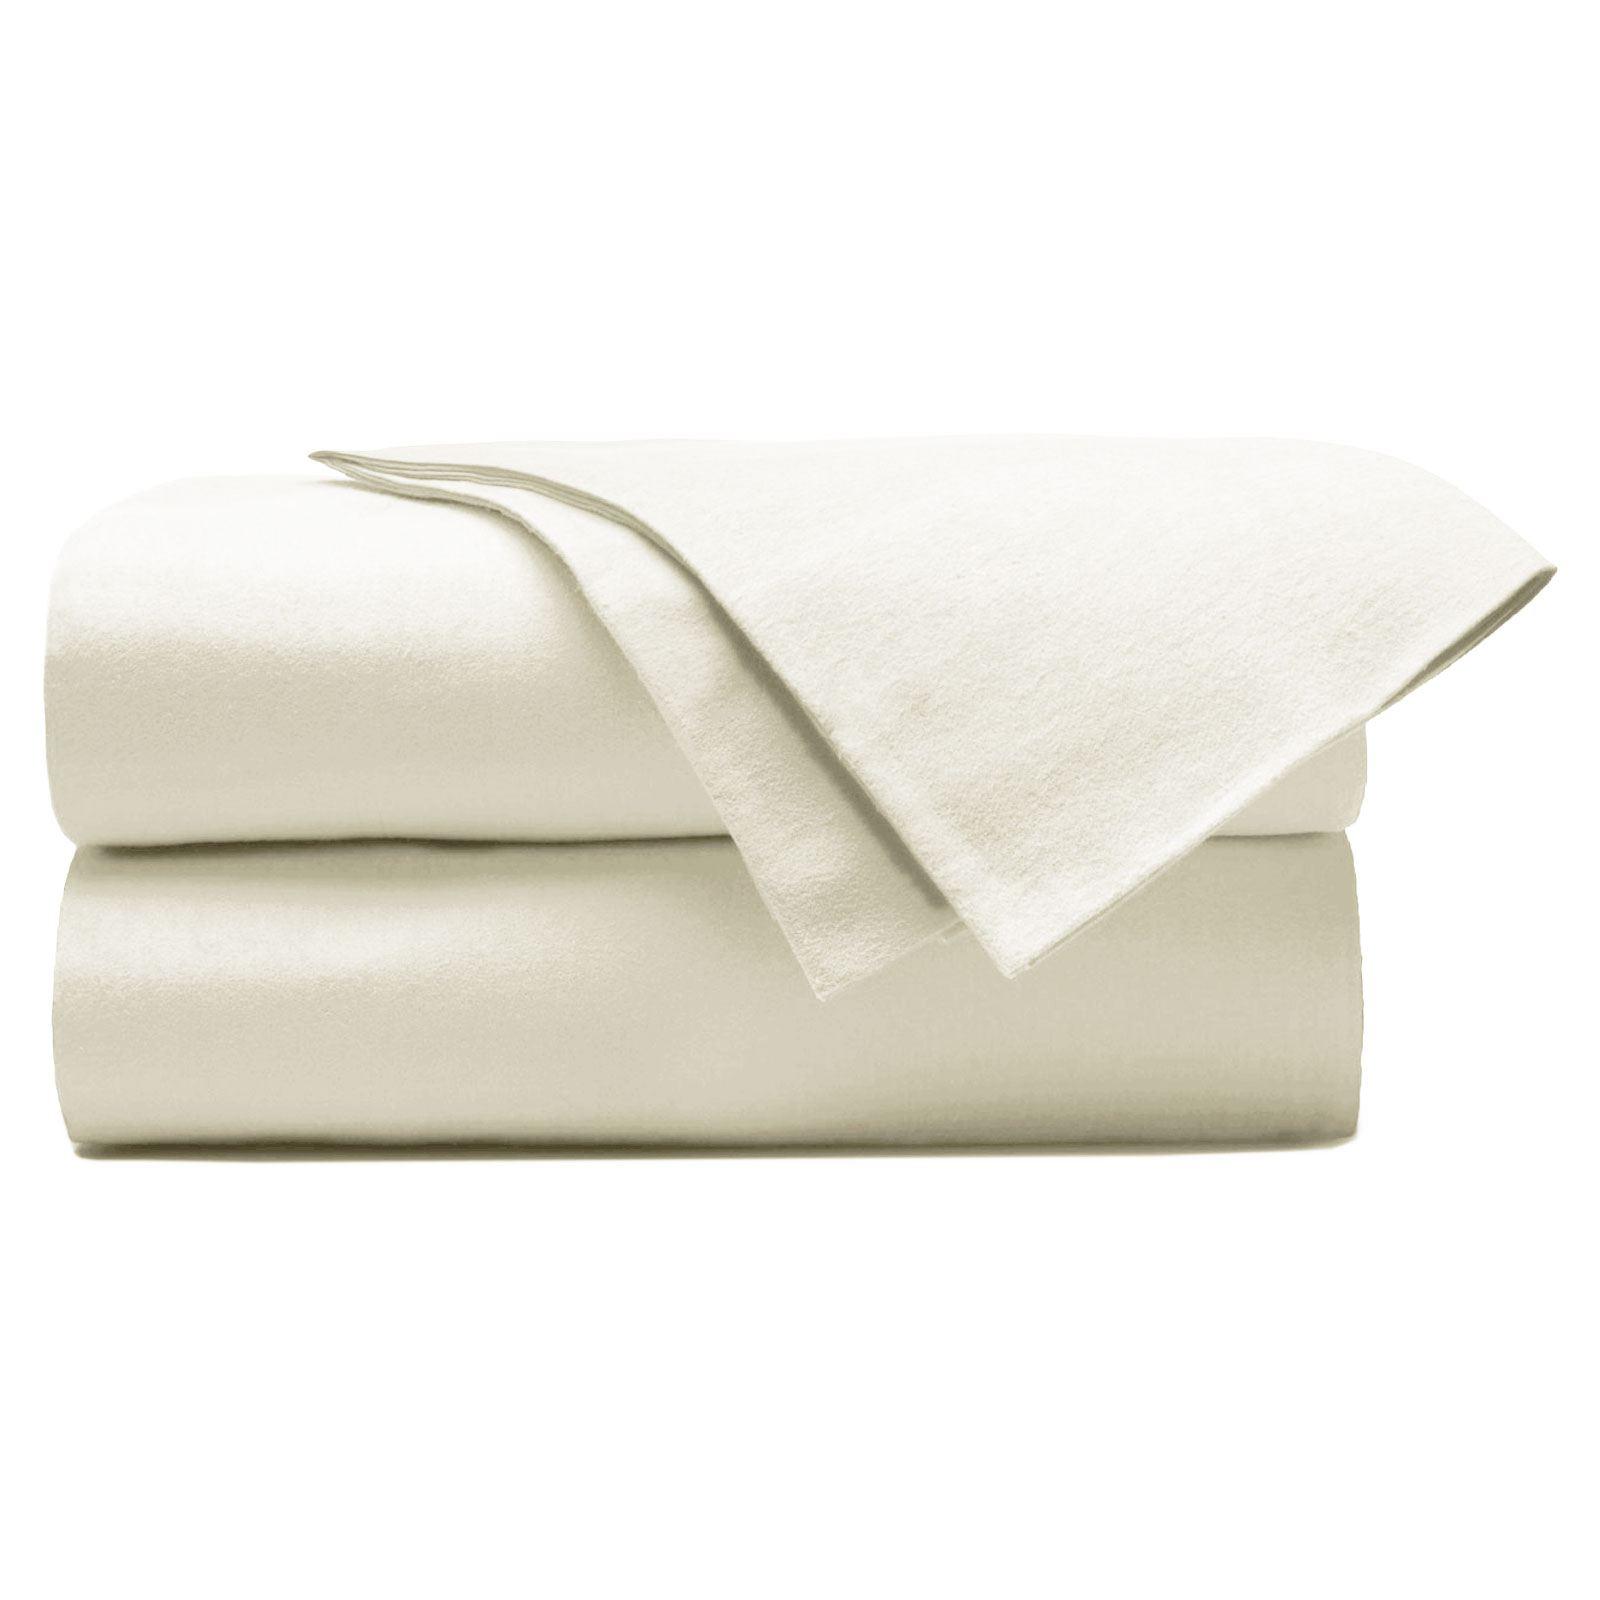 covers living textiles crib main products co dri waterproof crop protectors protector smart mattress